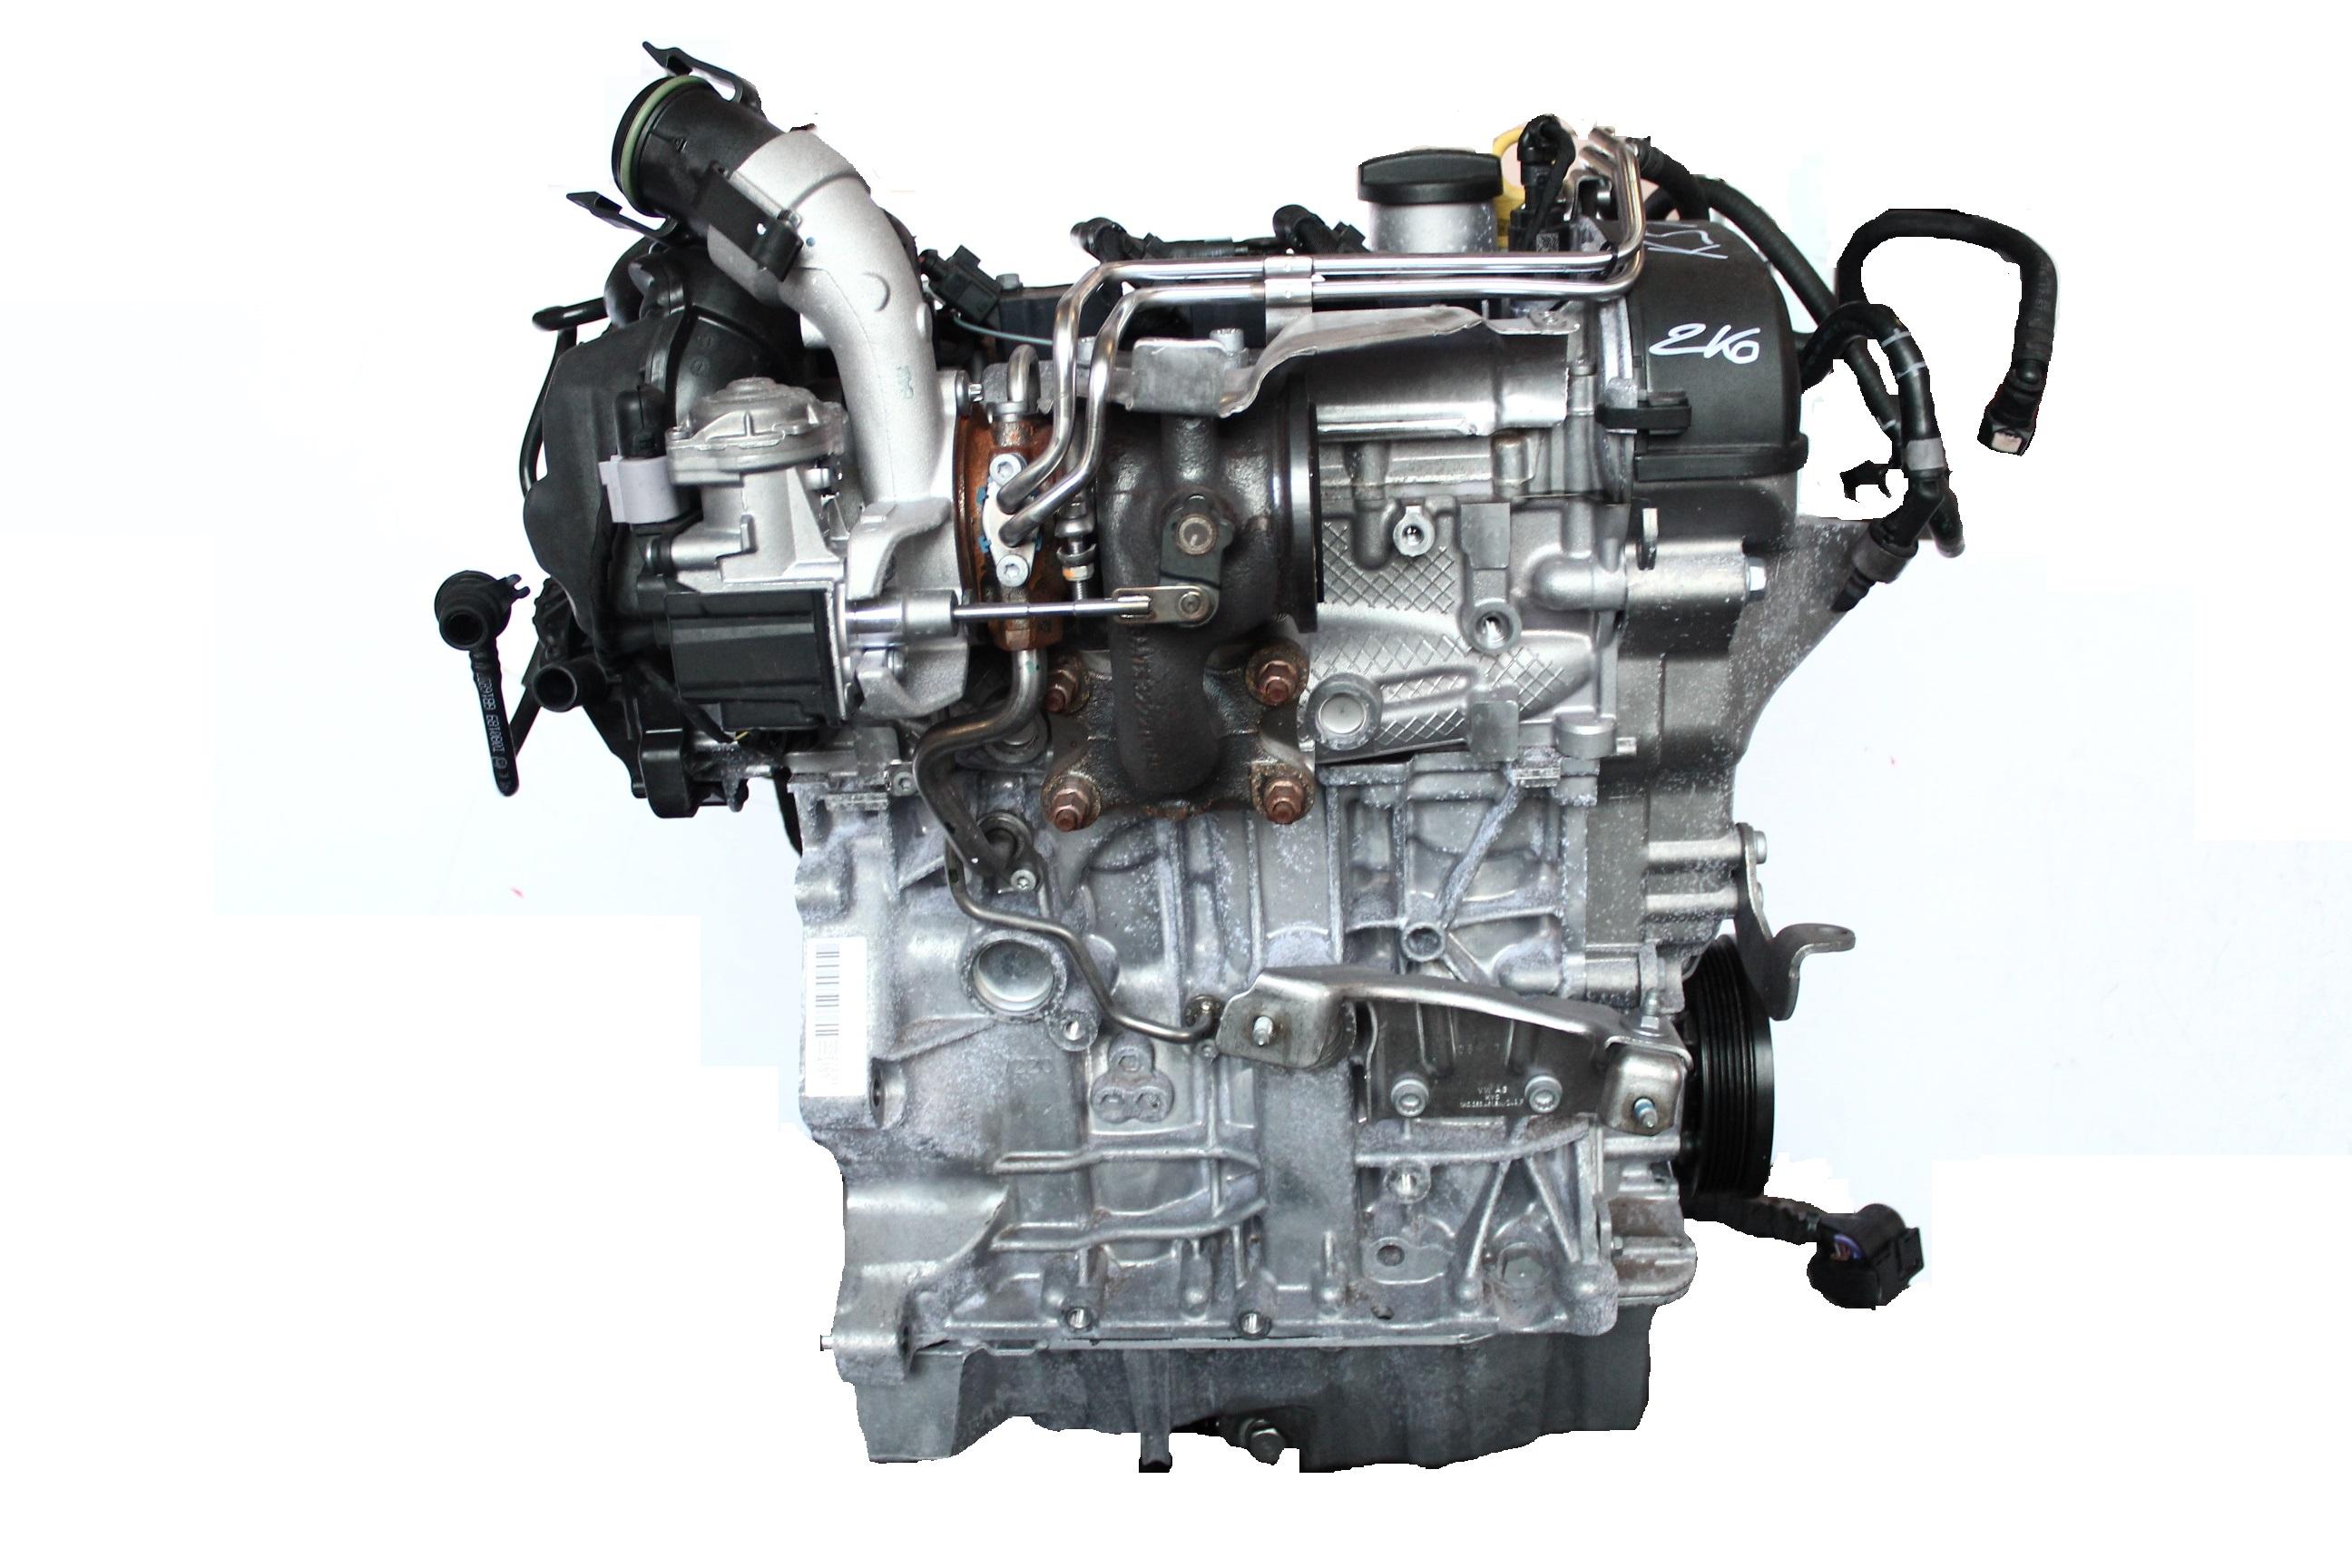 Motor 2017 Audi Seat Skoda VW A3 1,2 TFSI CJZ CJZA CJZB CJZC mit Anbauteilen